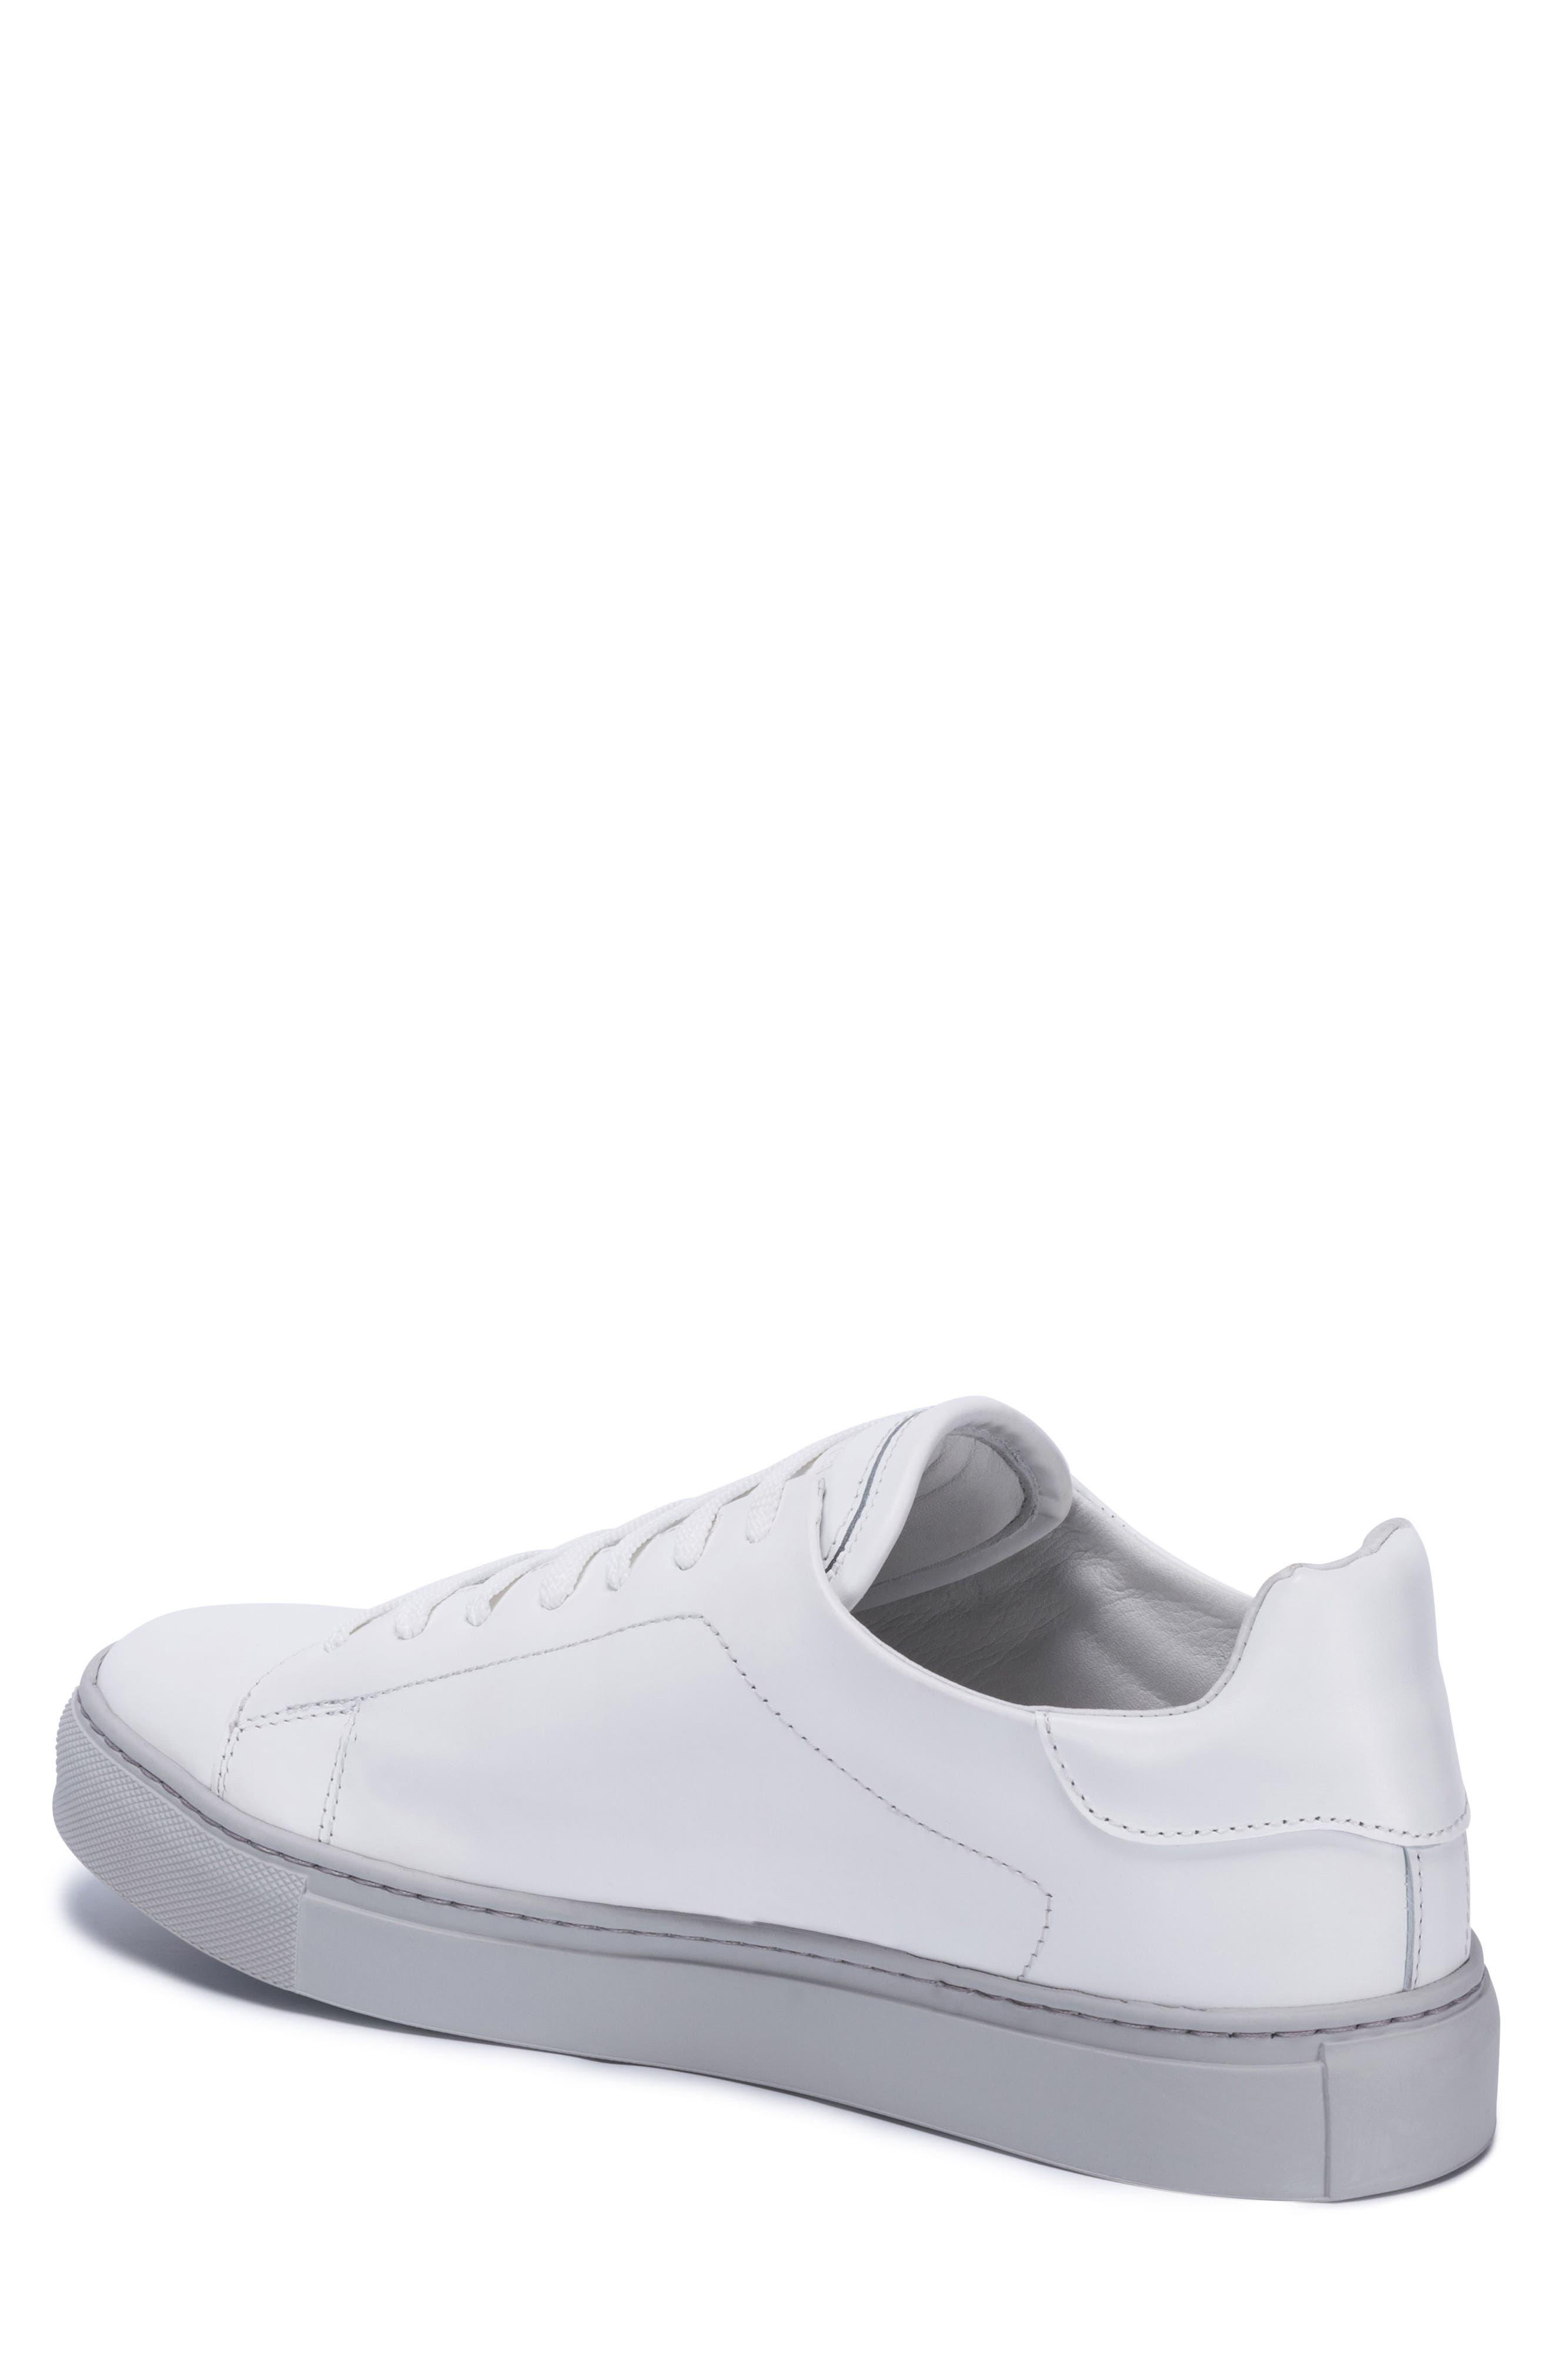 Massa Sneaker,                             Alternate thumbnail 2, color,                             Bianco Leather